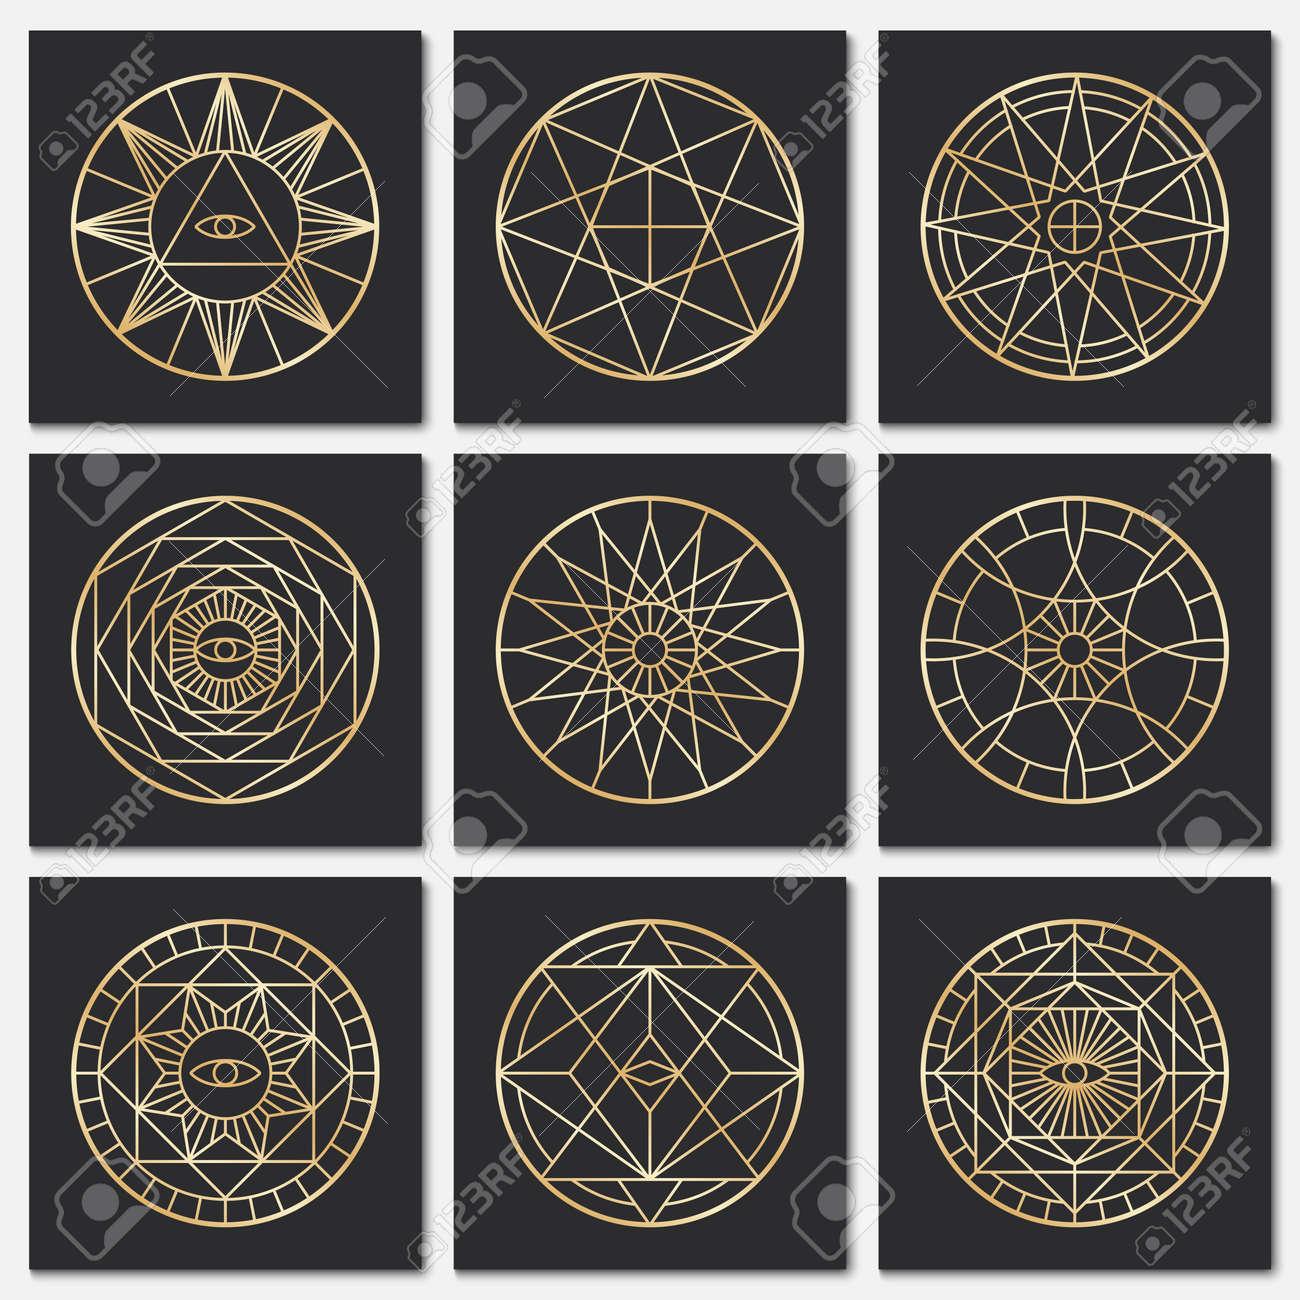 Ancient masonic pentagrams. Steampunk gold sacred vector symbols on dark backgrounds. Mystery circle esoteric symbol, freemasonry geometry spirituality illustration - 167437354